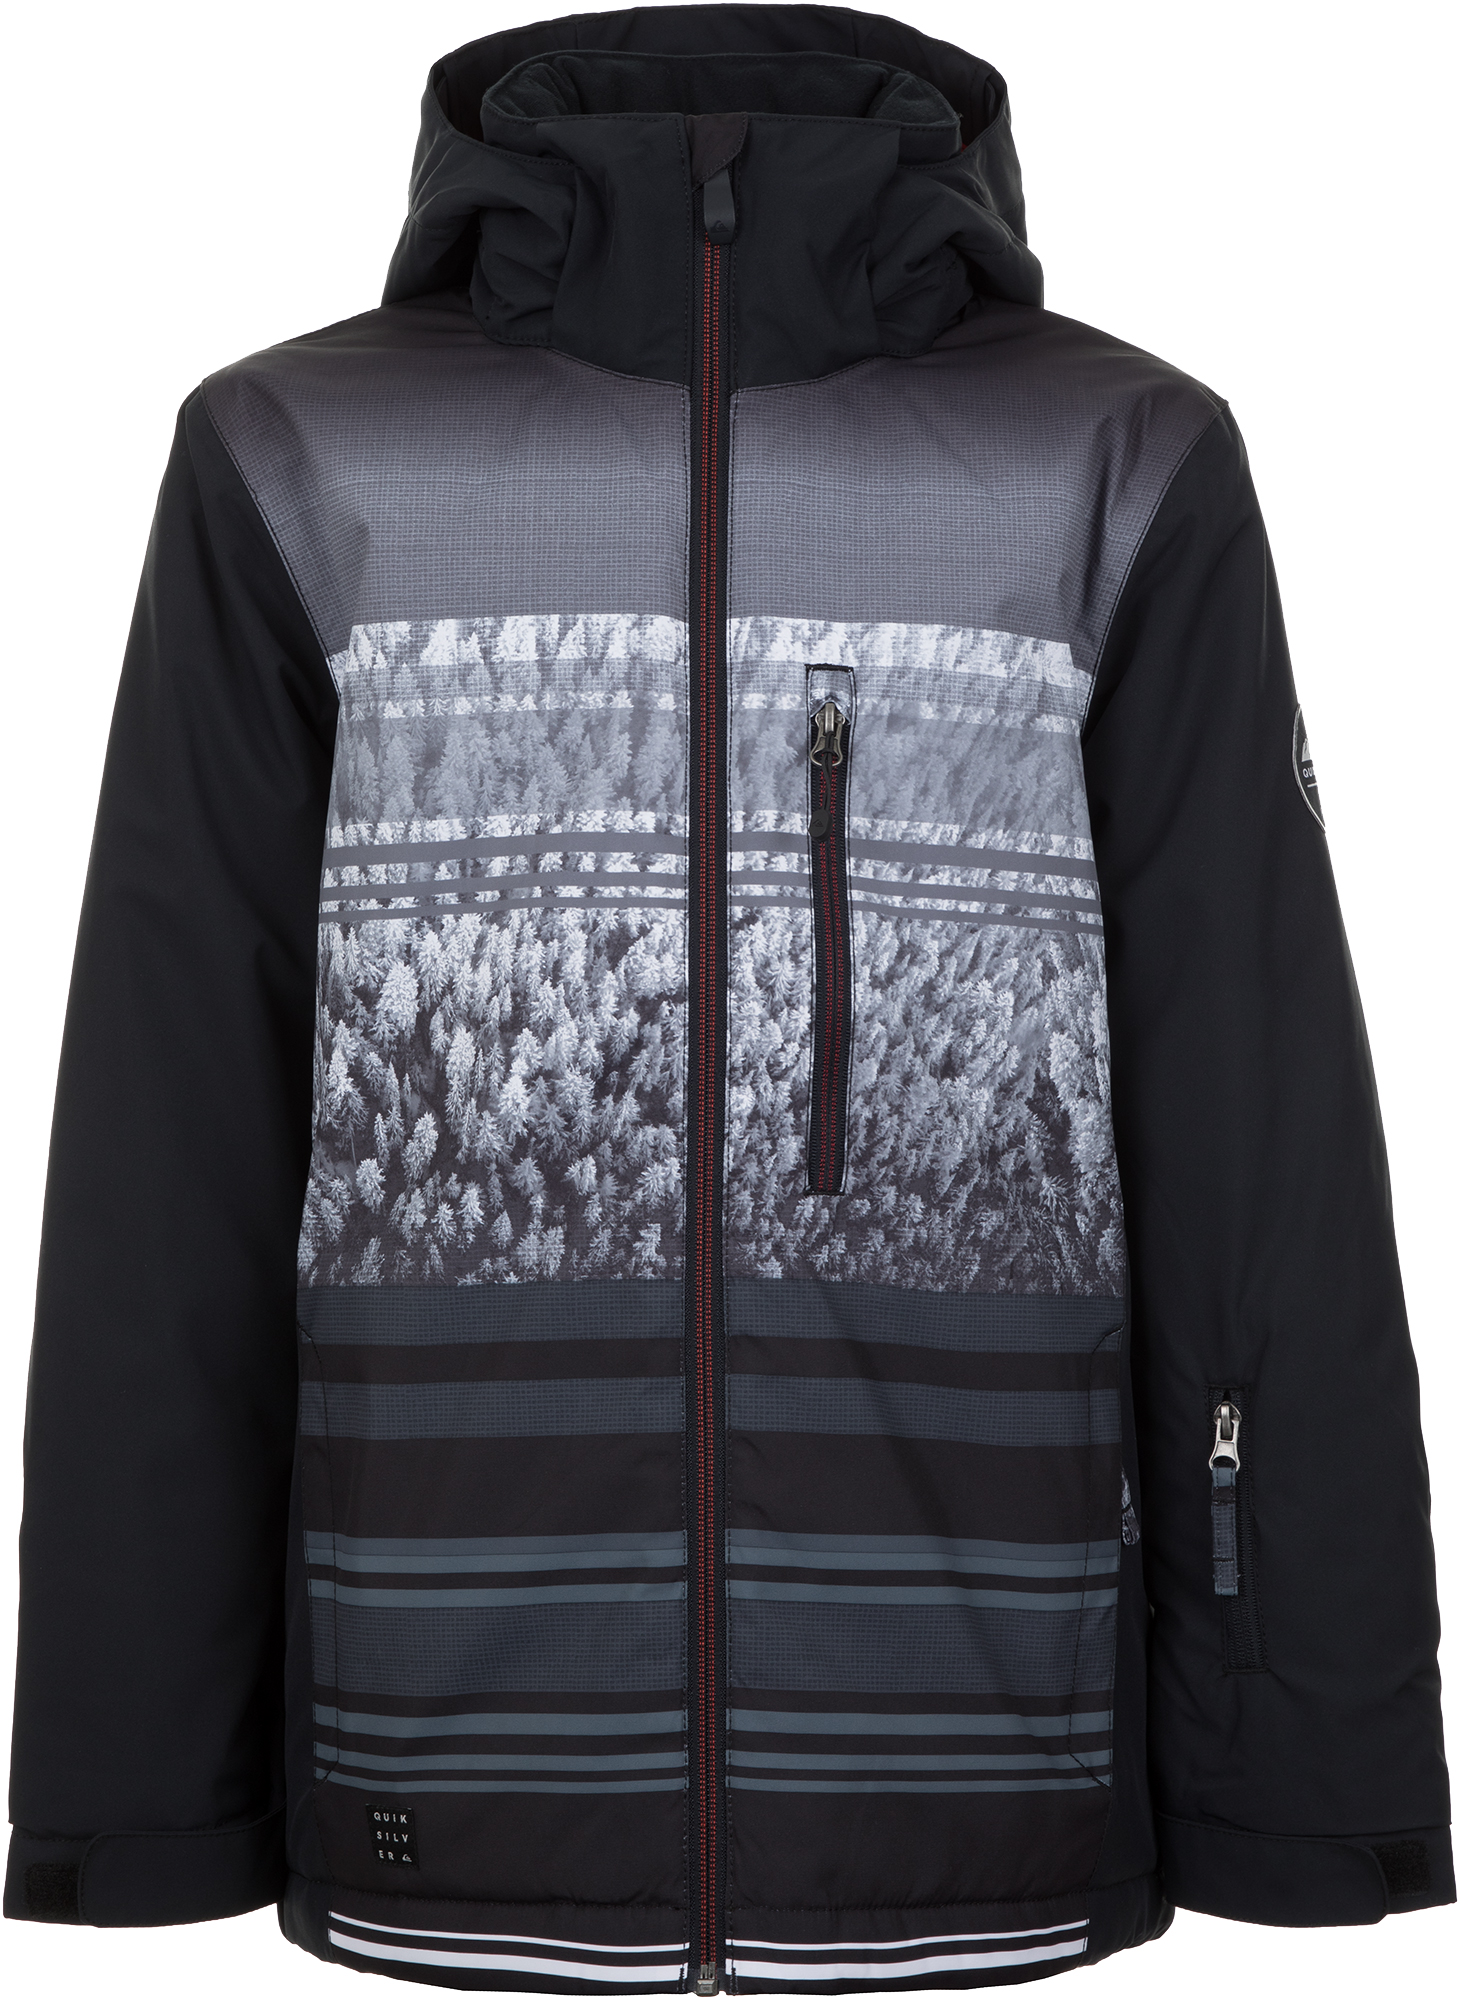 Quiksilver Куртка утепленная для мальчиков Quiksilver Mission Engineered, размер 164-170 цена